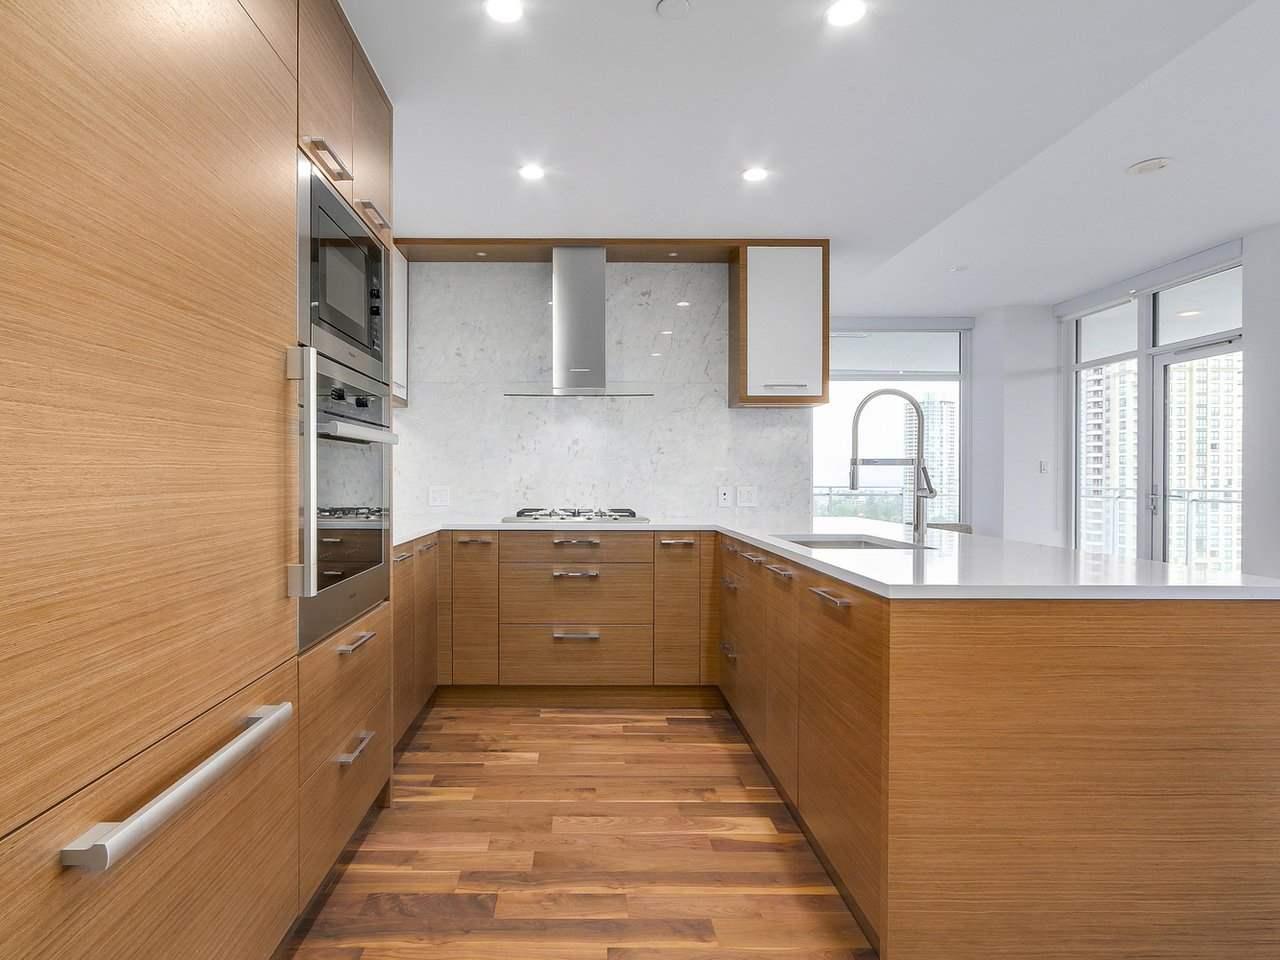 Condo Apartment at 1202 4360 BERESFORD STREET, Unit 1202, Burnaby South, British Columbia. Image 5